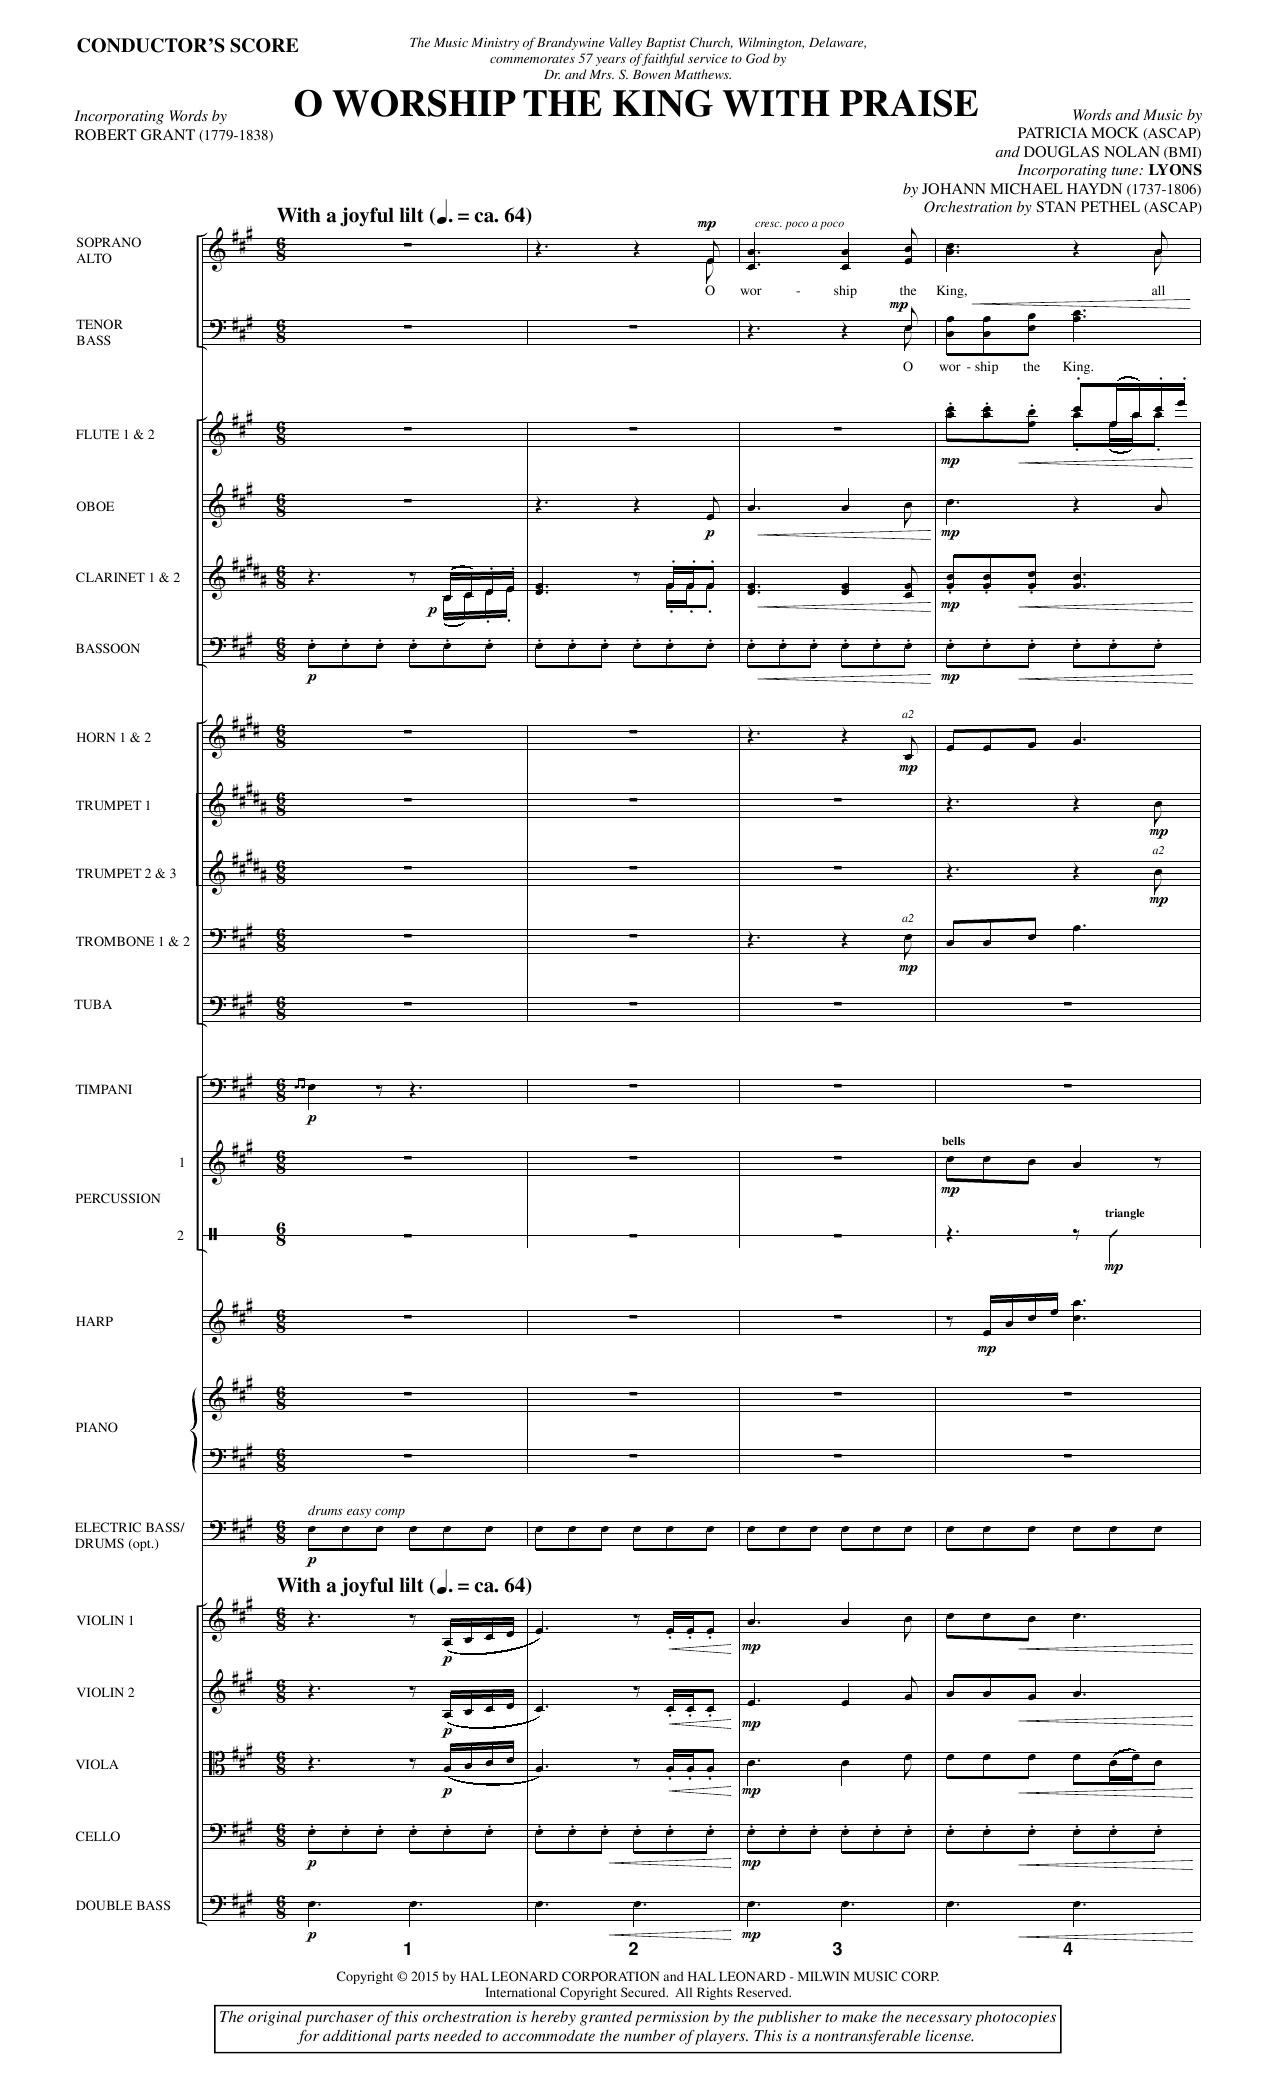 O Worship the King with Praise - Full Score sheet music